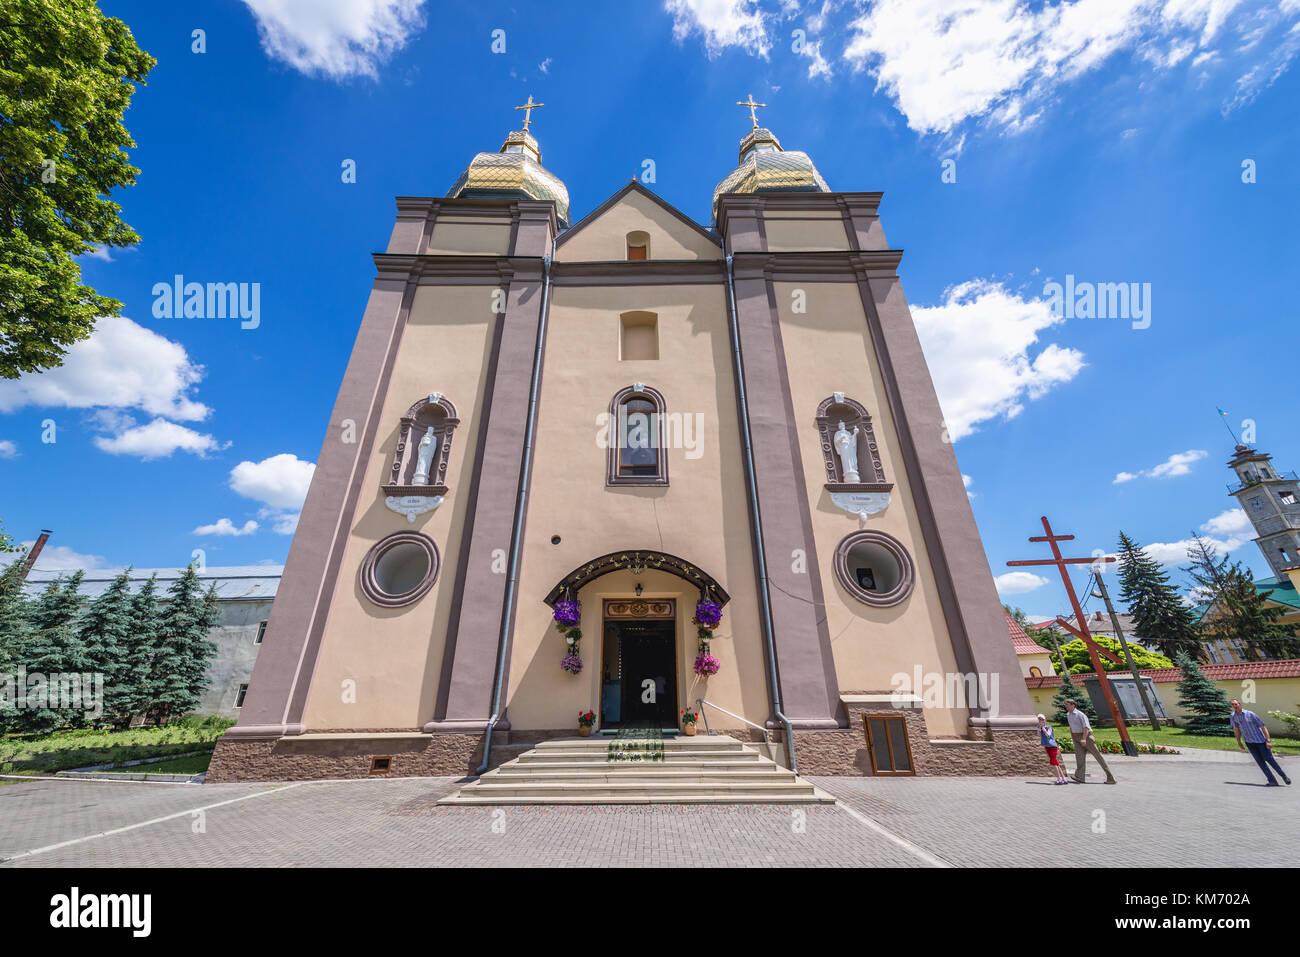 Exterior of Saint Volodymyr Church of Carmelite monastery in Stock